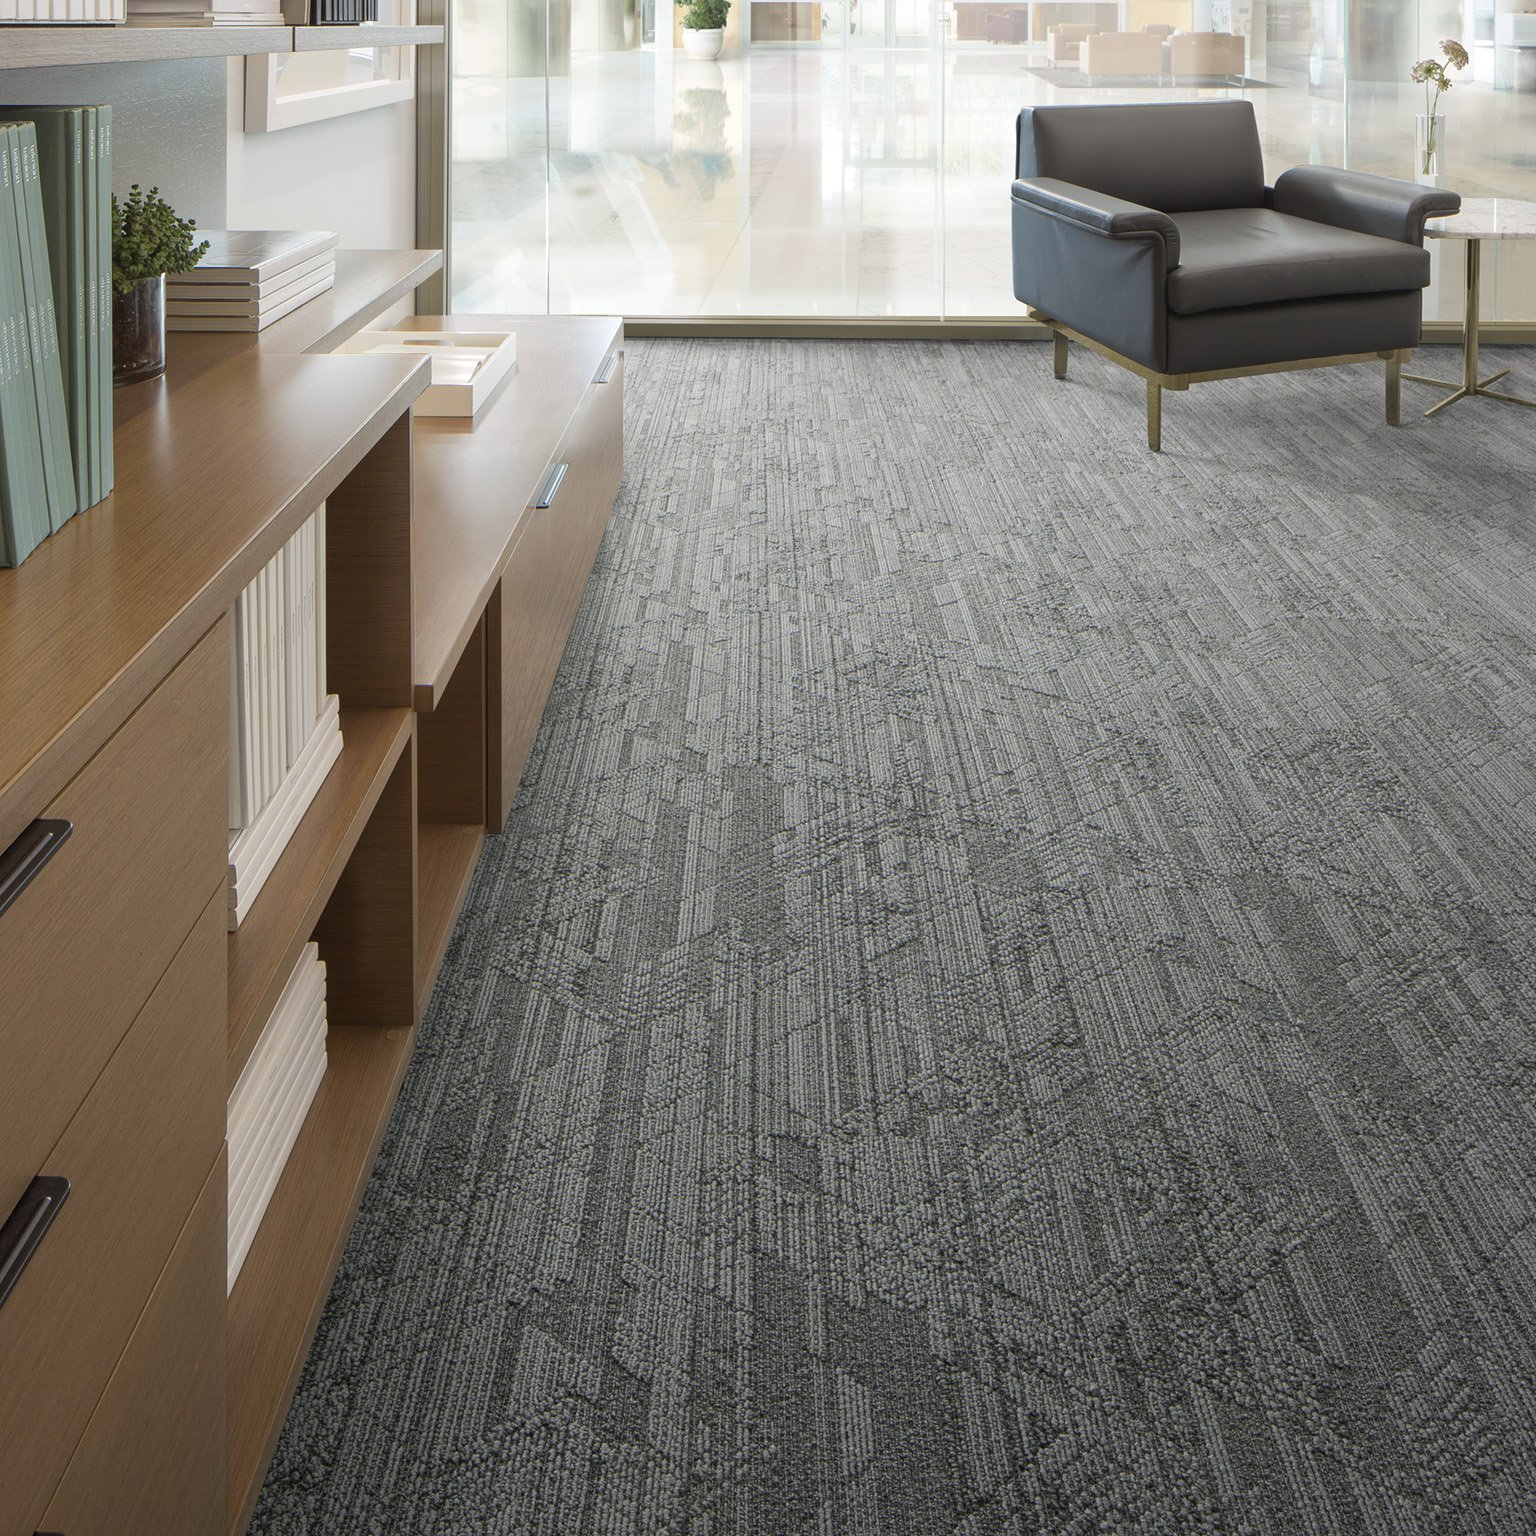 Summit Modular Carpet Mannington Commercial